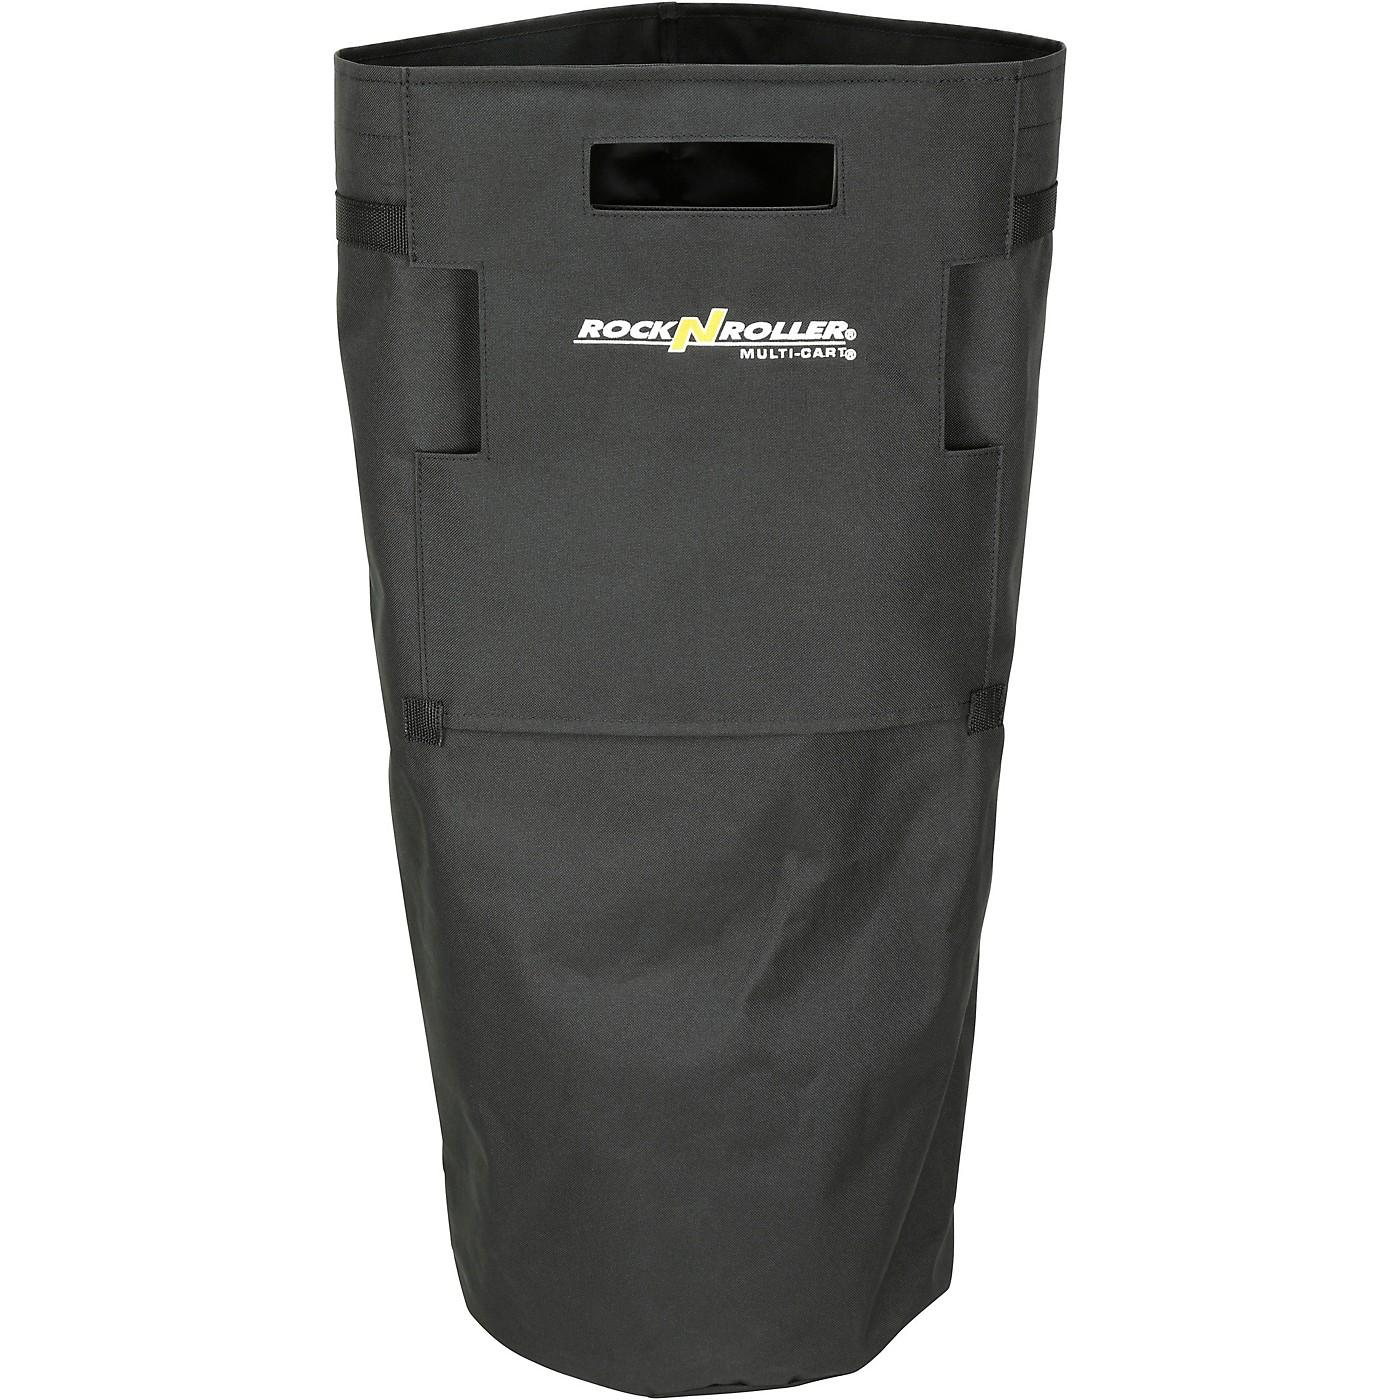 Rock N Roller RSA-HBR8 Handle Bag With Rigid Bottom (Fits R8, R10, R12 Carts) thumbnail